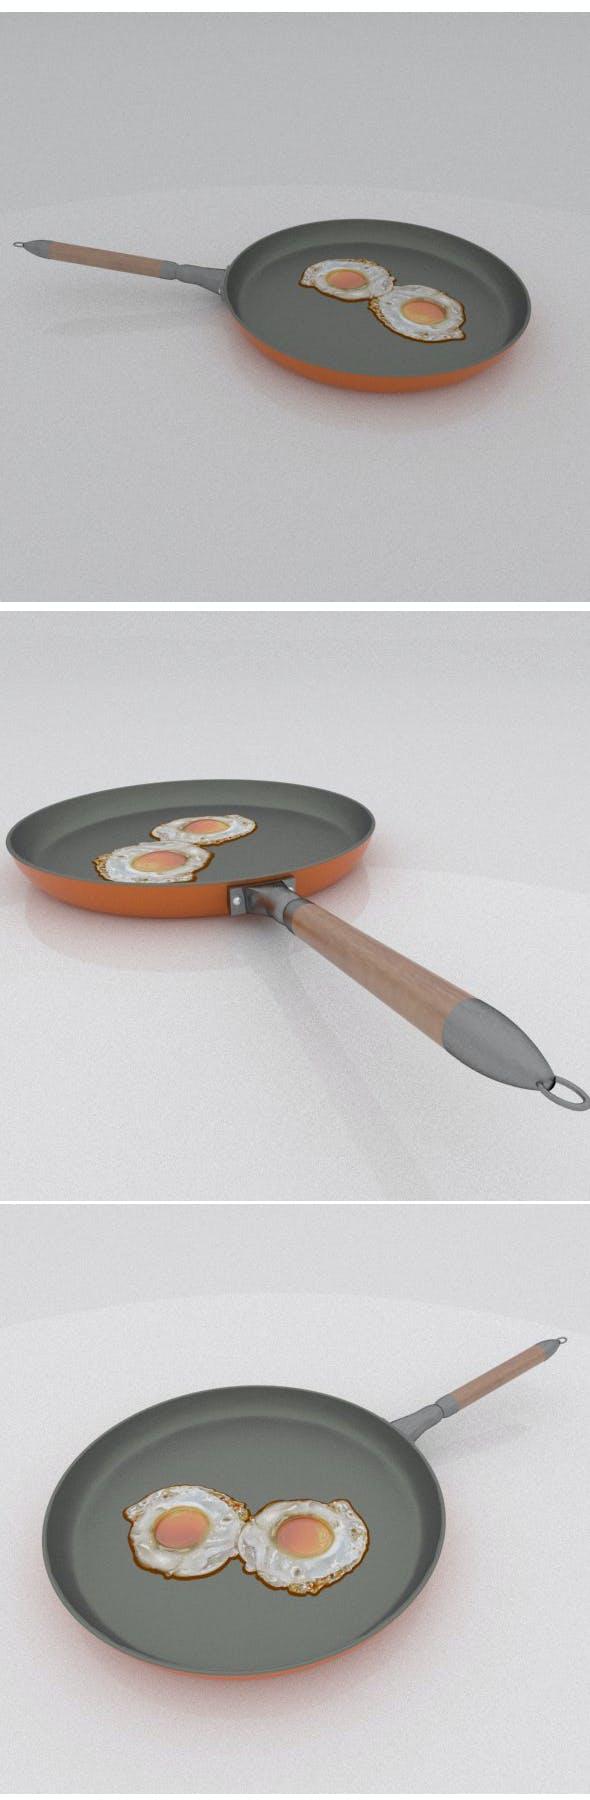 Fried eggs on pan - 3DOcean Item for Sale